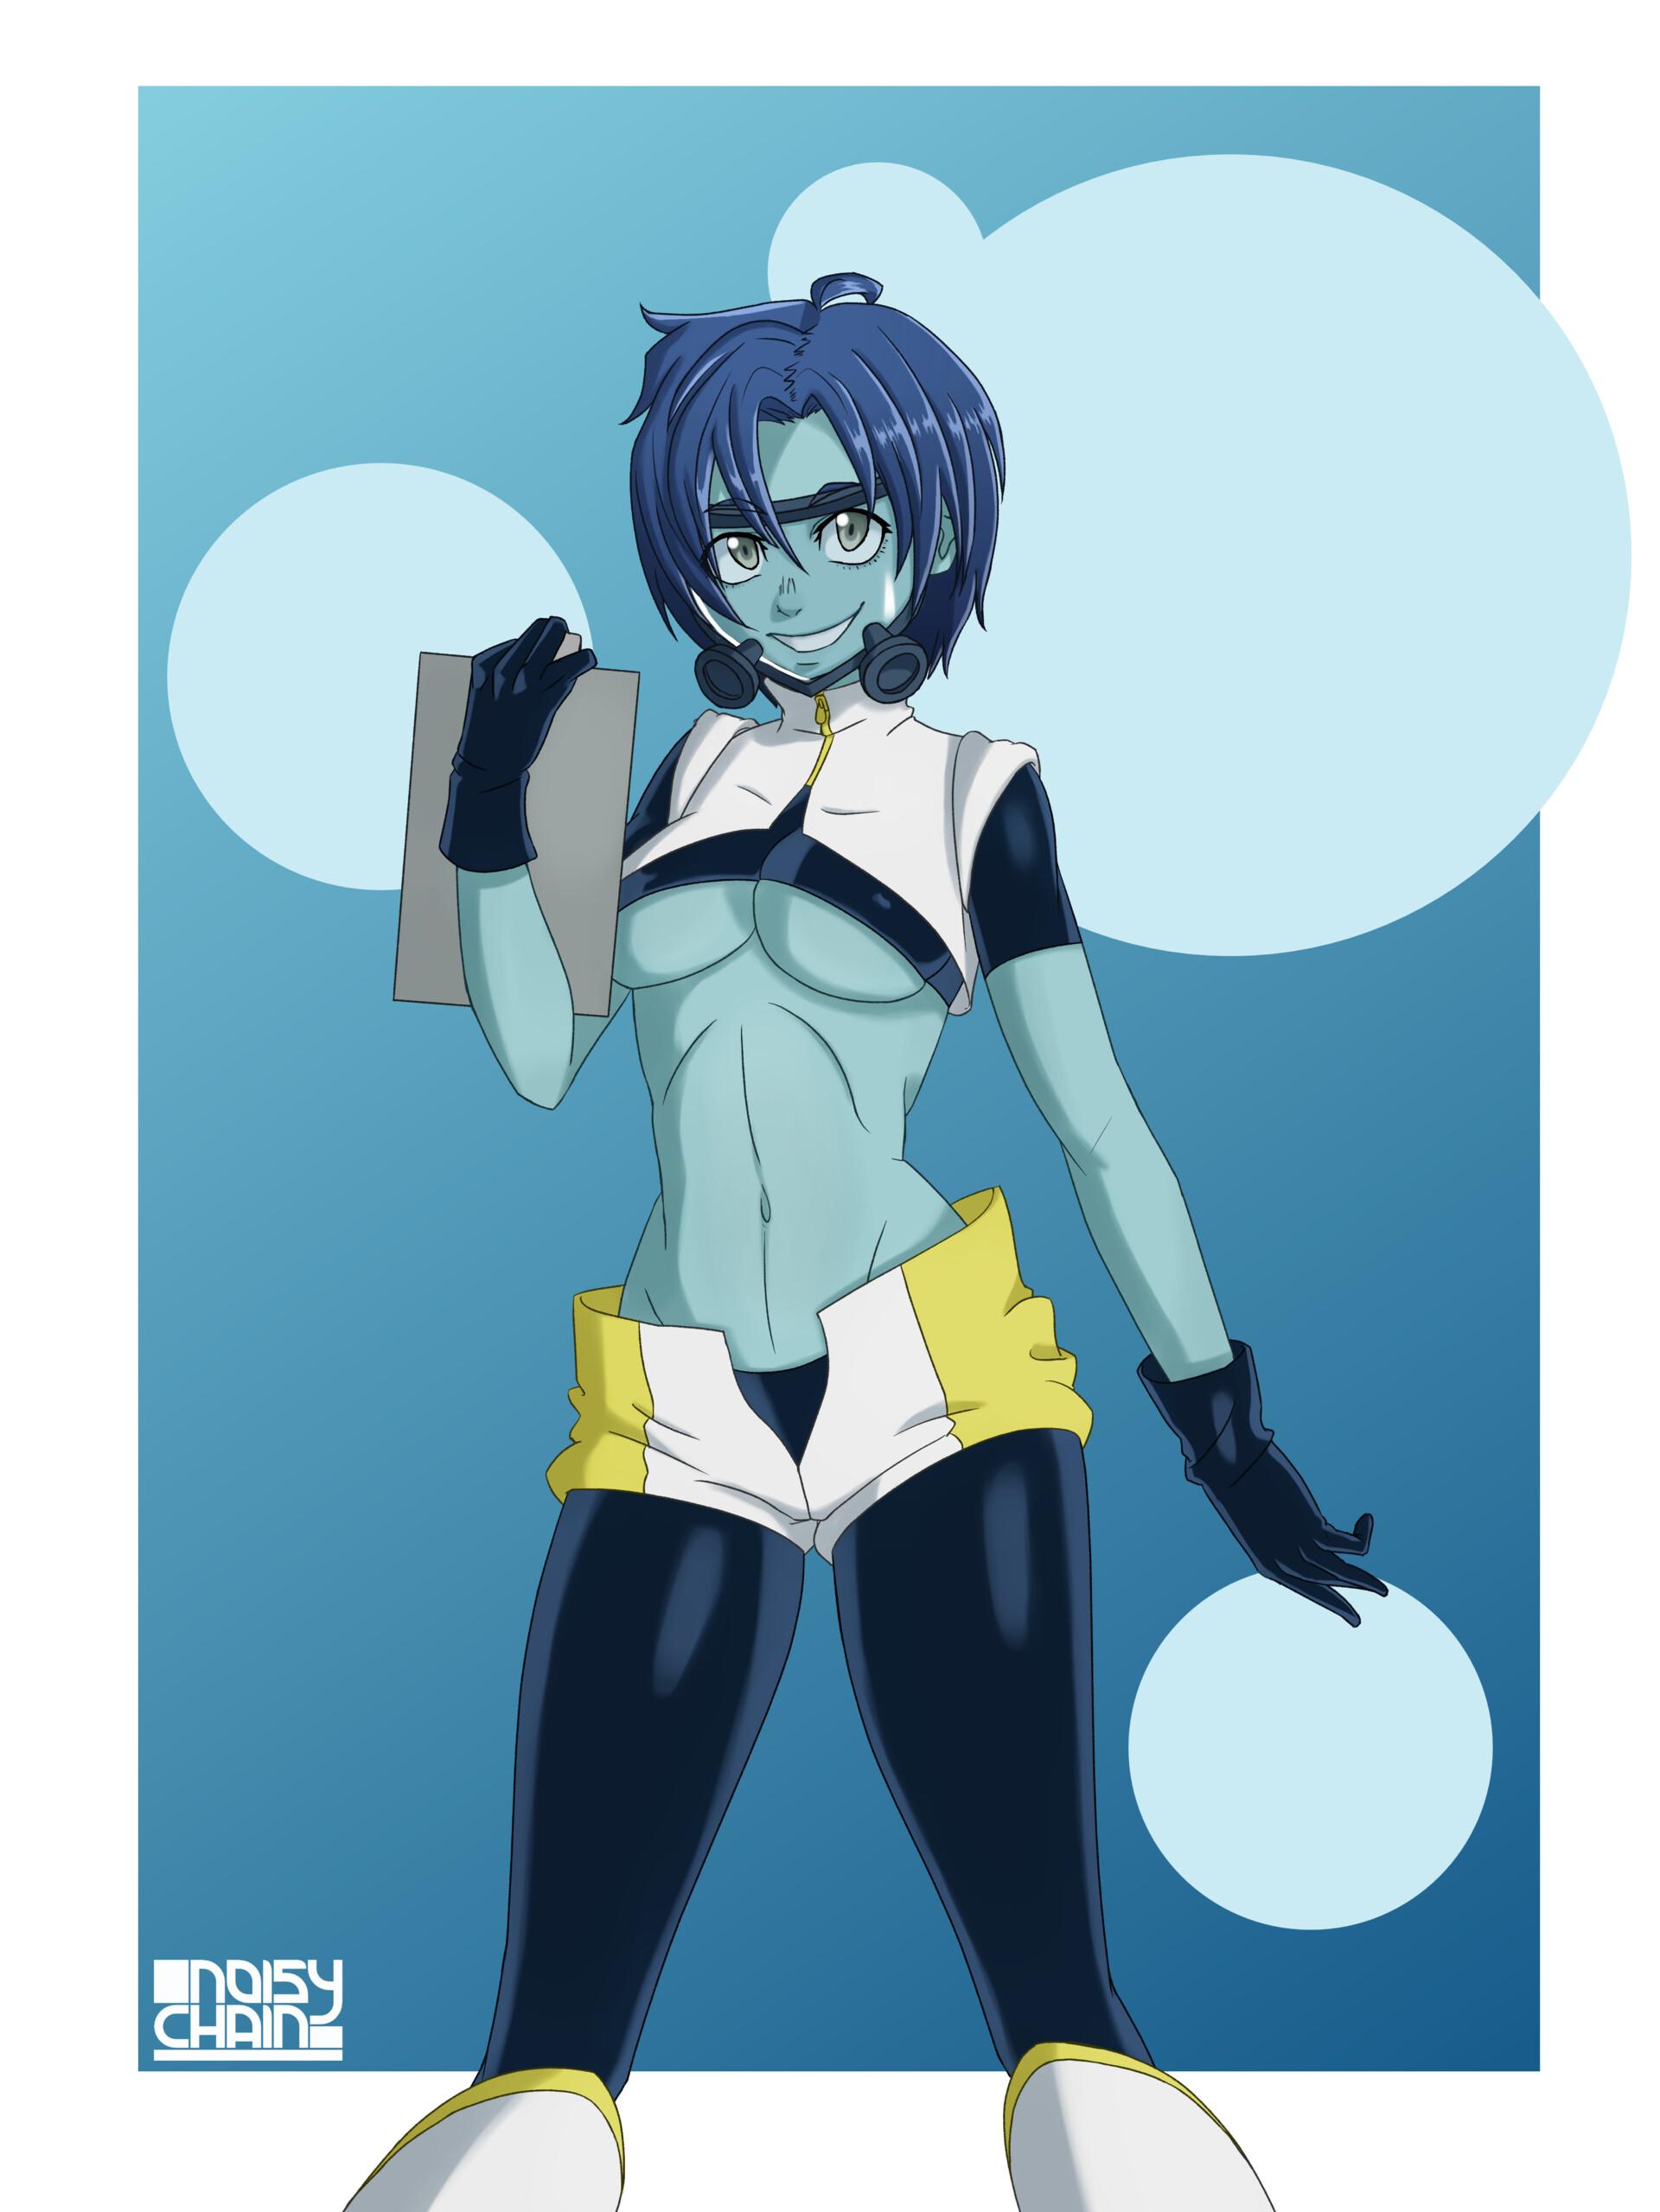 artstation - bubble girl